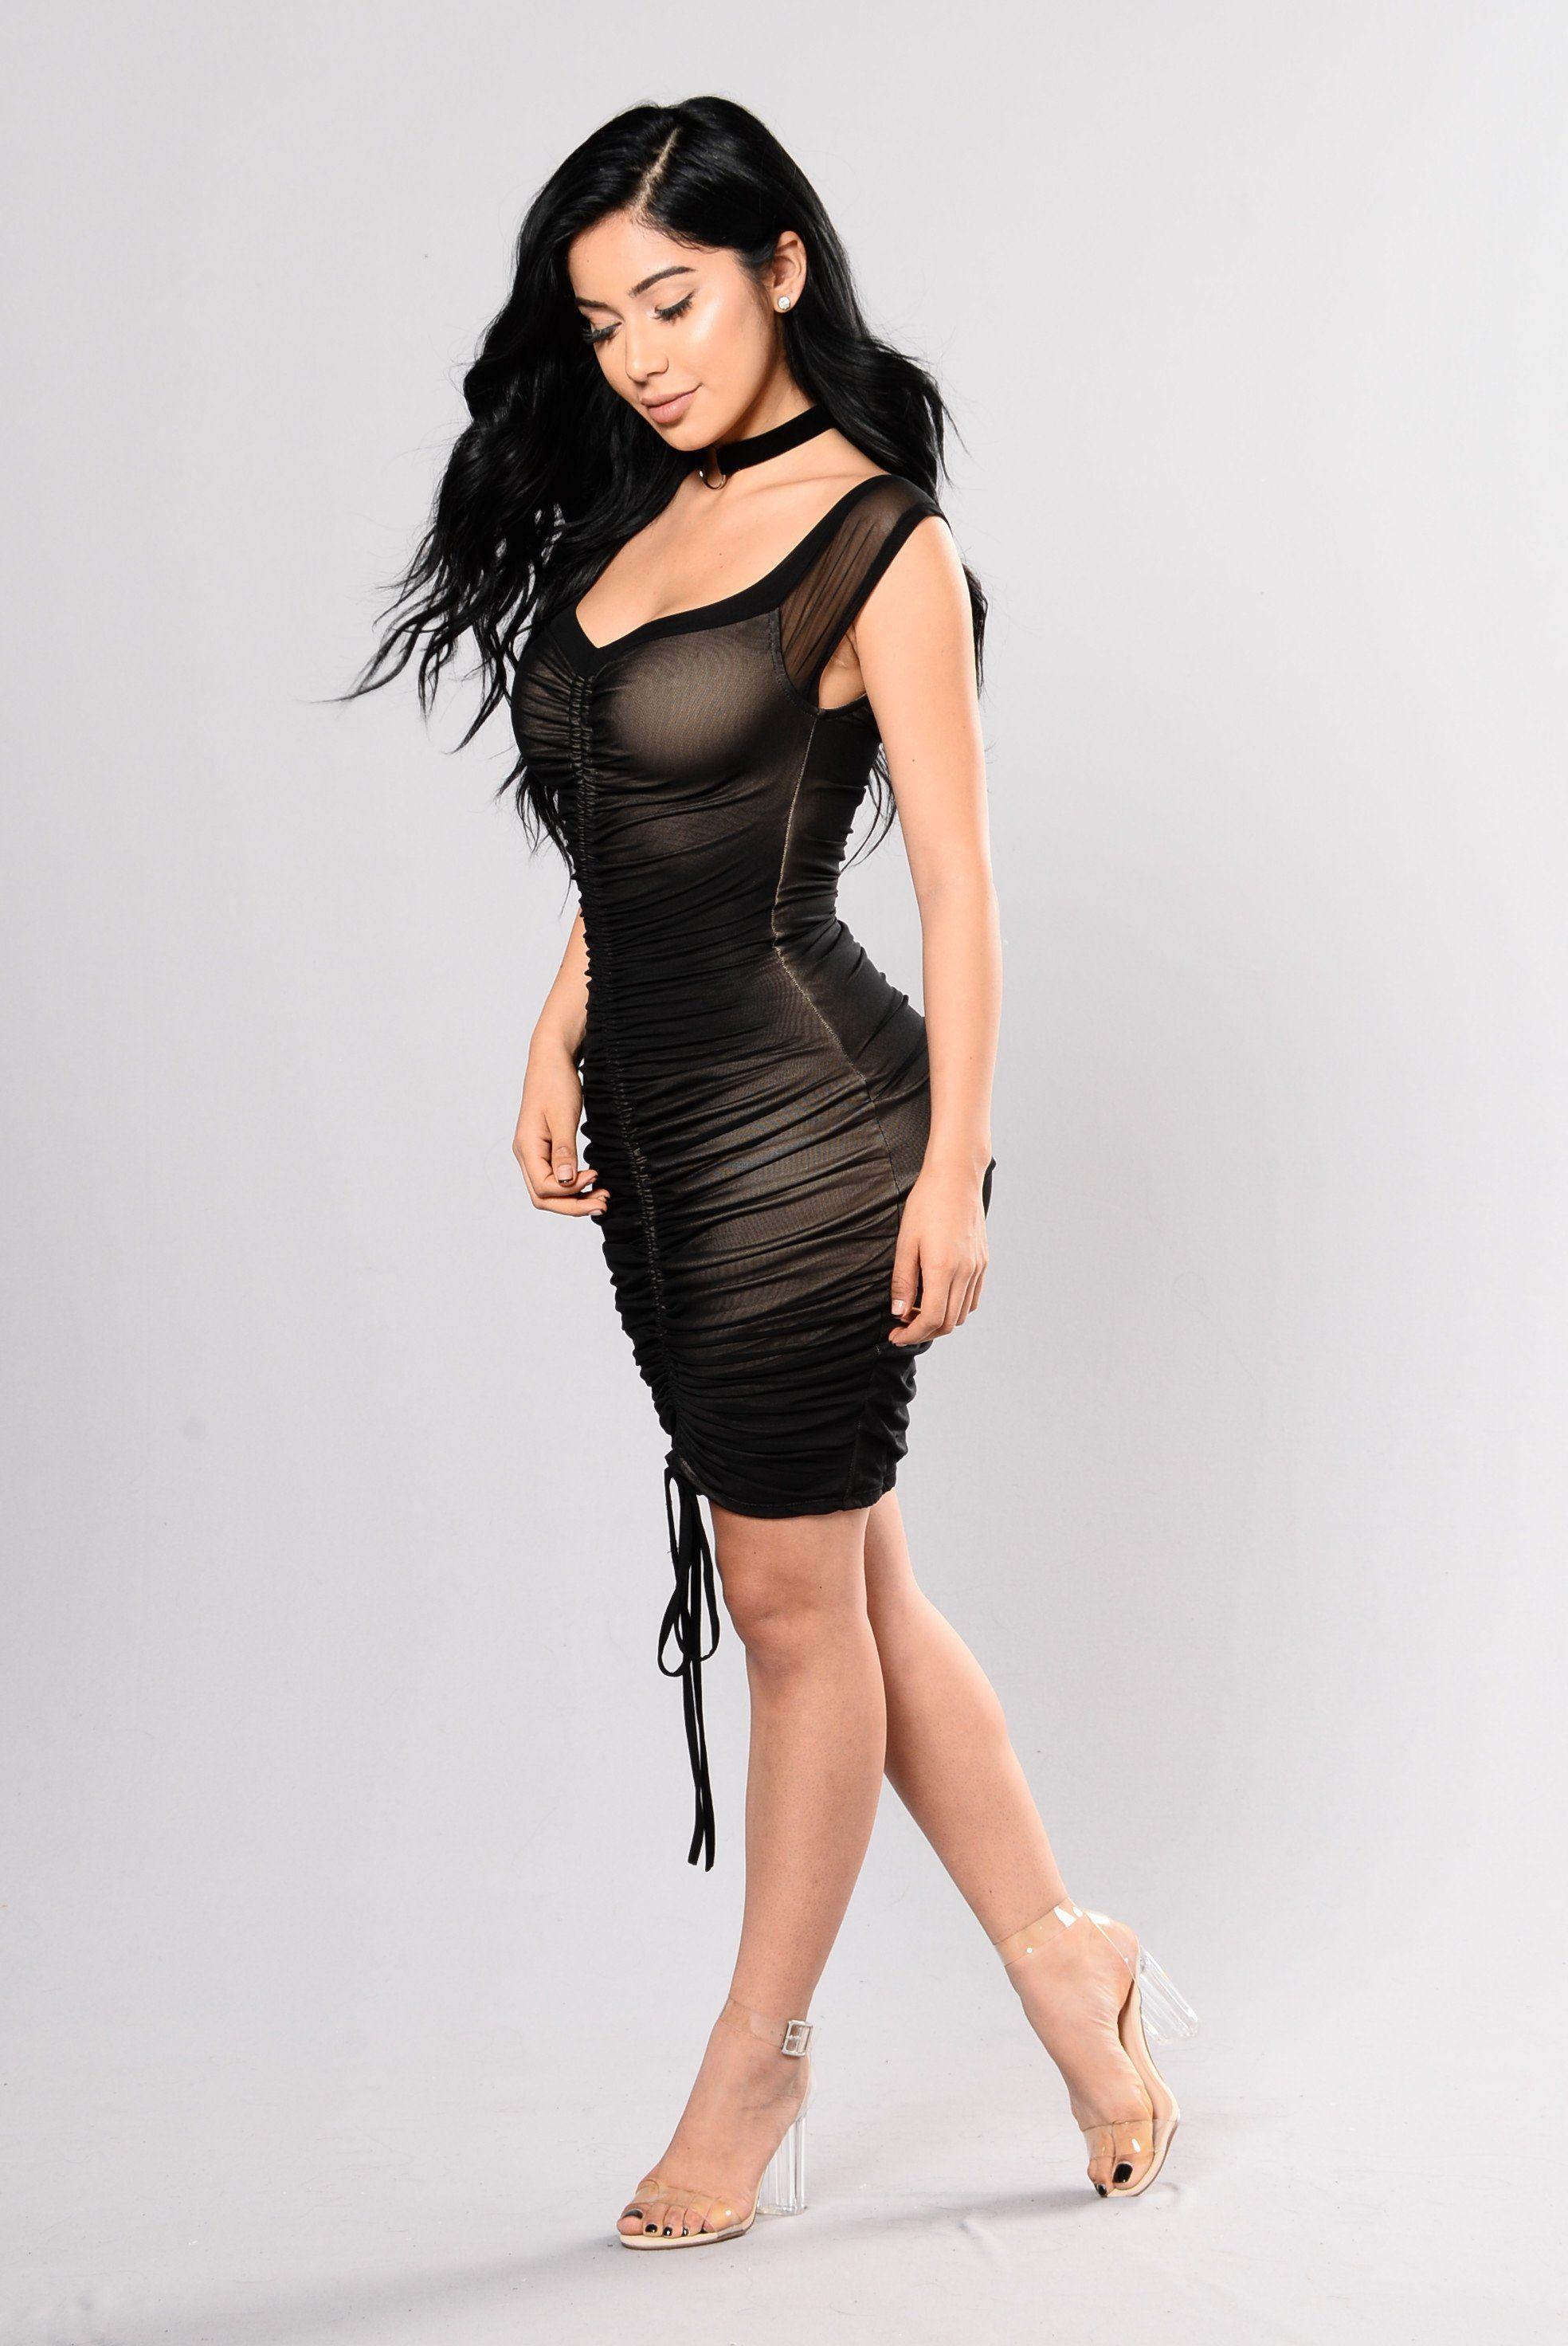 Dresiree dress black mesh dress black mesh and nude